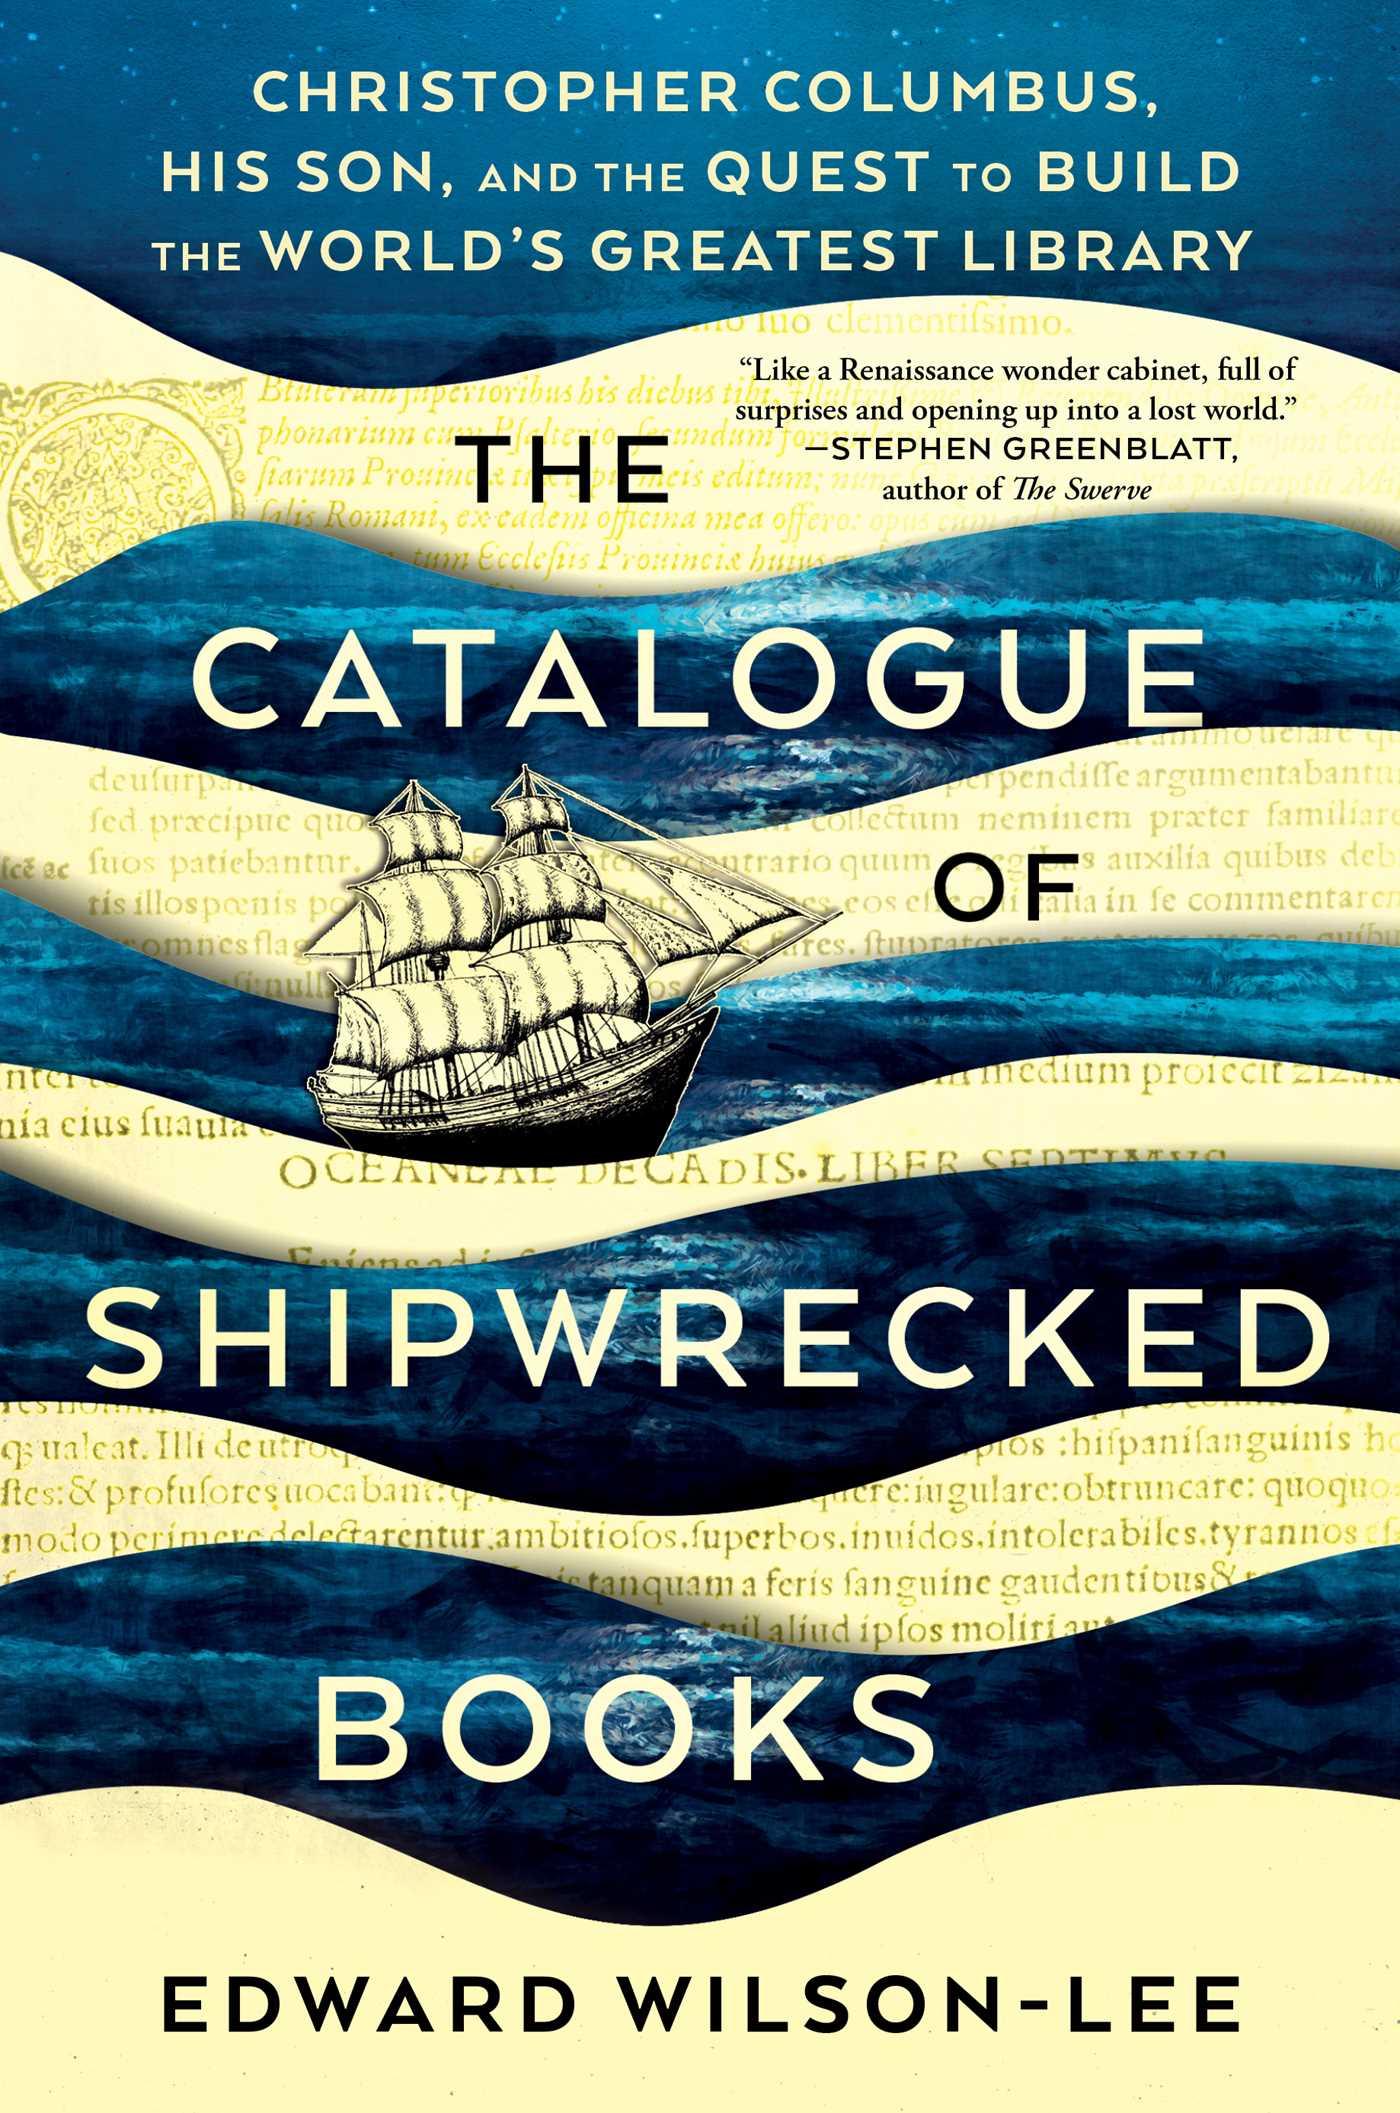 TheCatalogueOfShipwreckedBooks.jpg